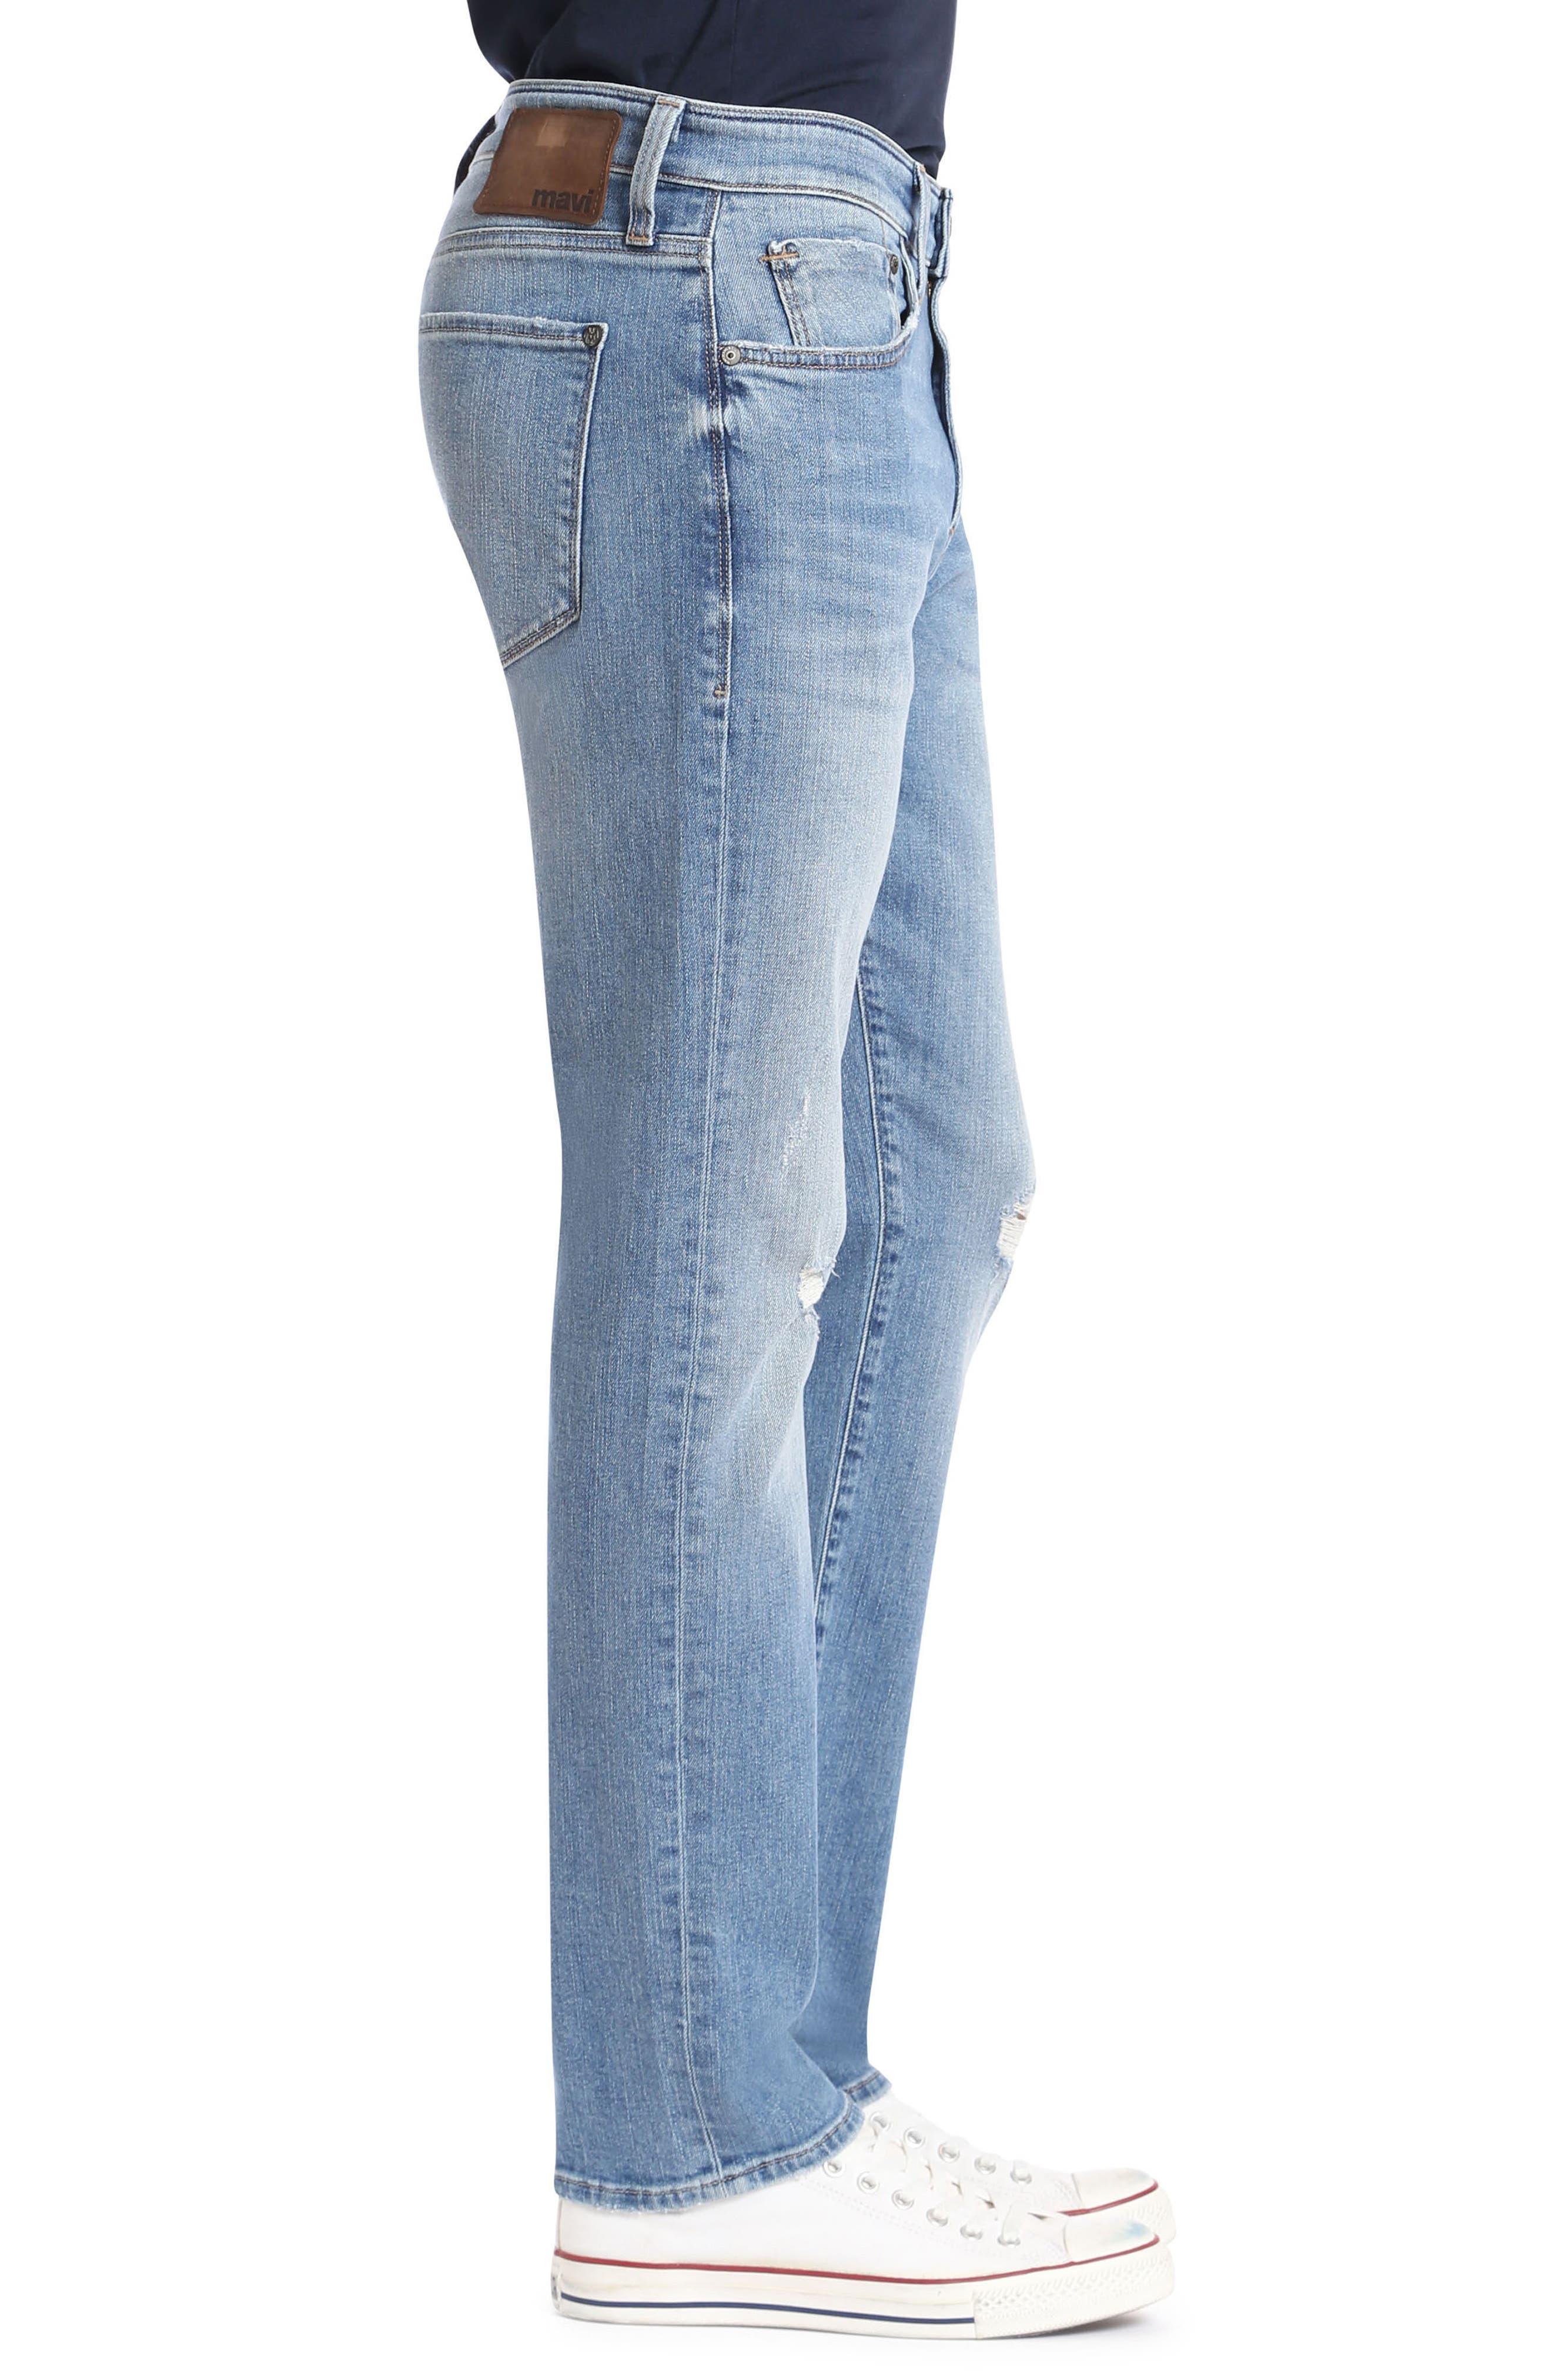 Jake Slim Fit Jeans,                             Alternate thumbnail 3, color,                             420